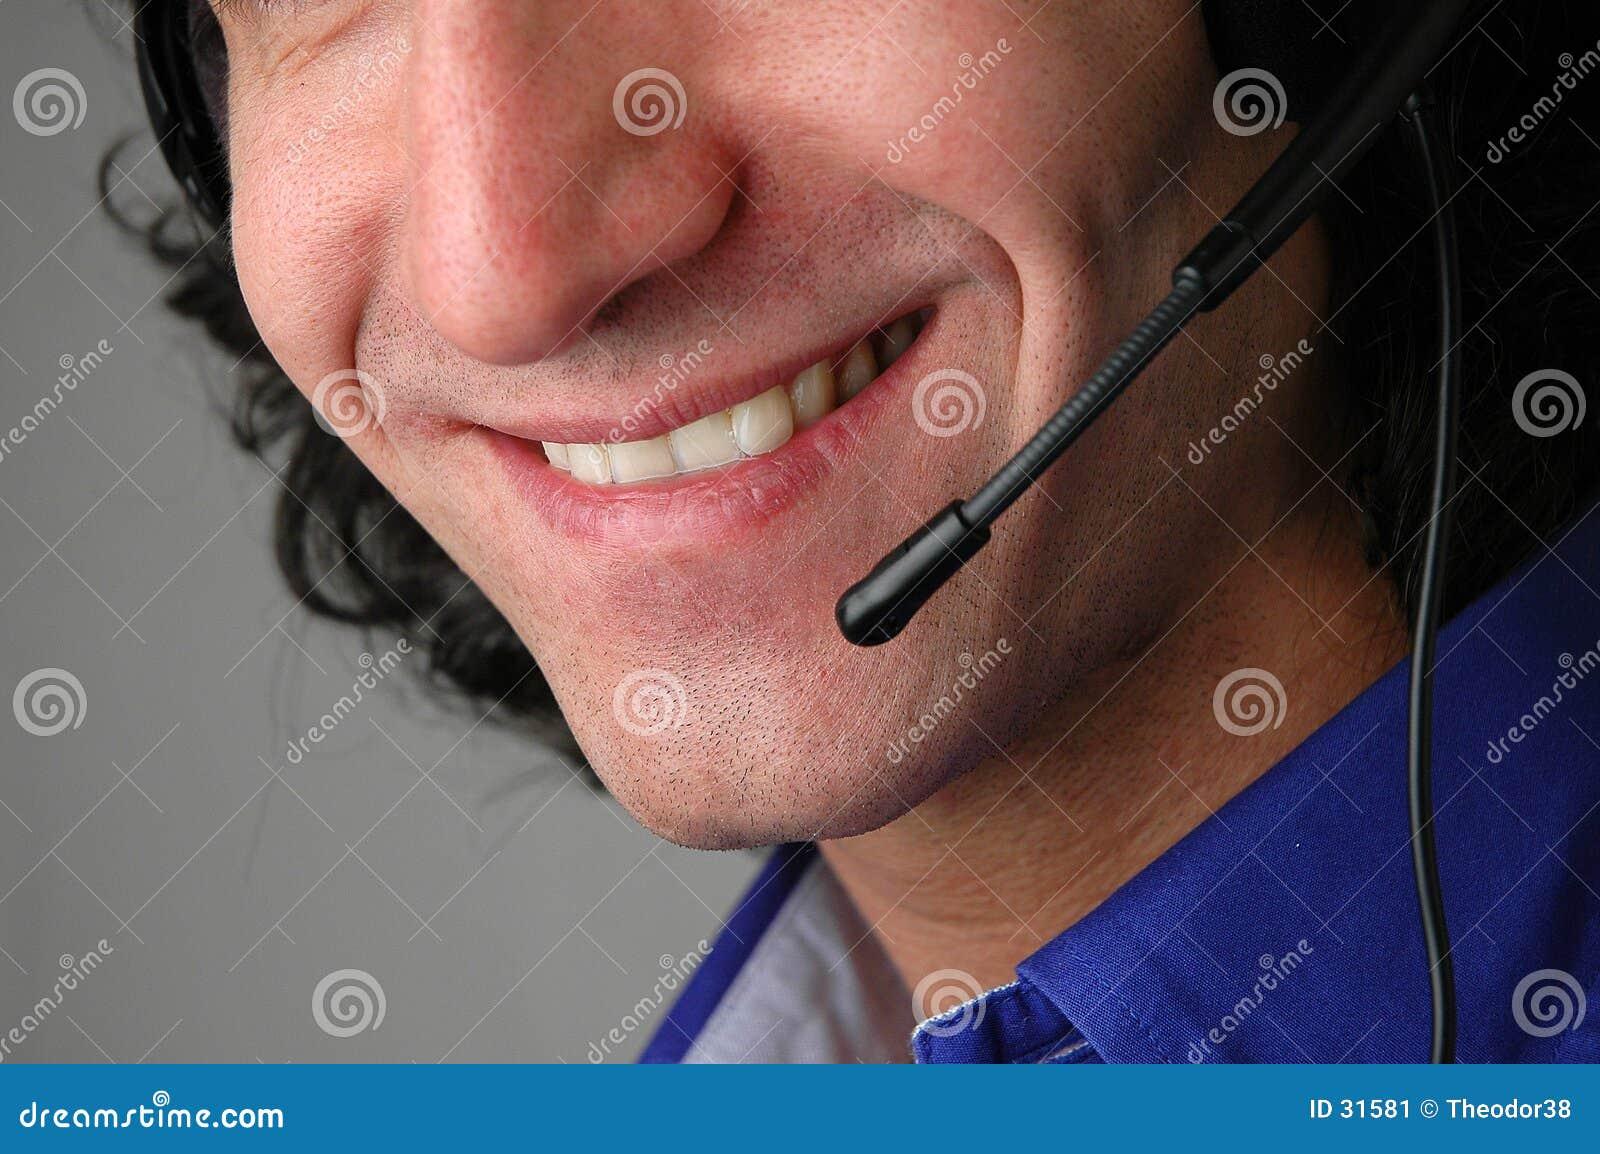 Customer service-10